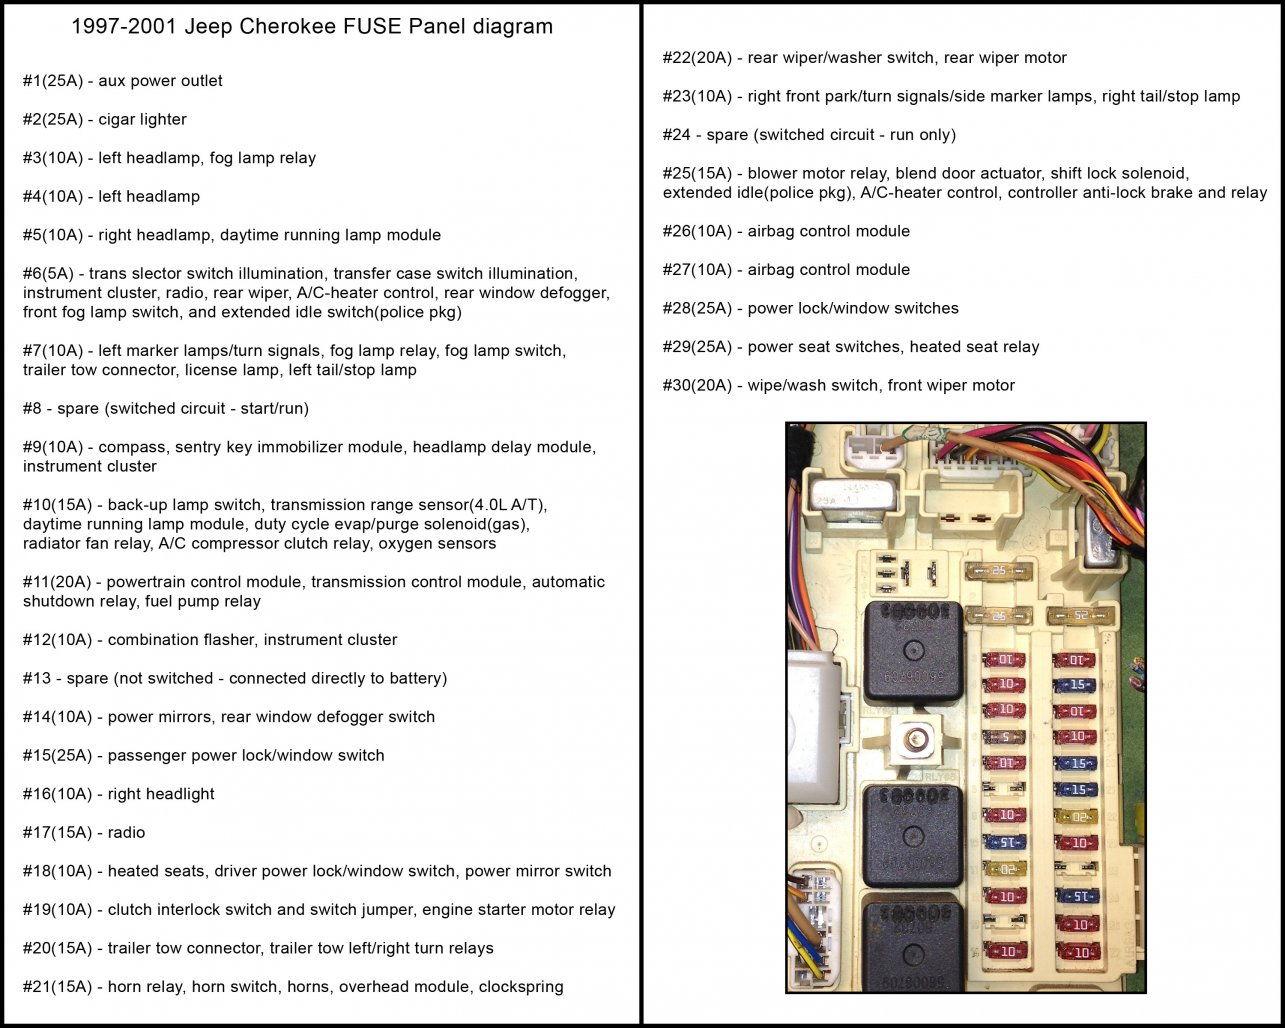 1997 cherokee fuse box wiring diagram save  1997 jeep cherokee fuse box location #14